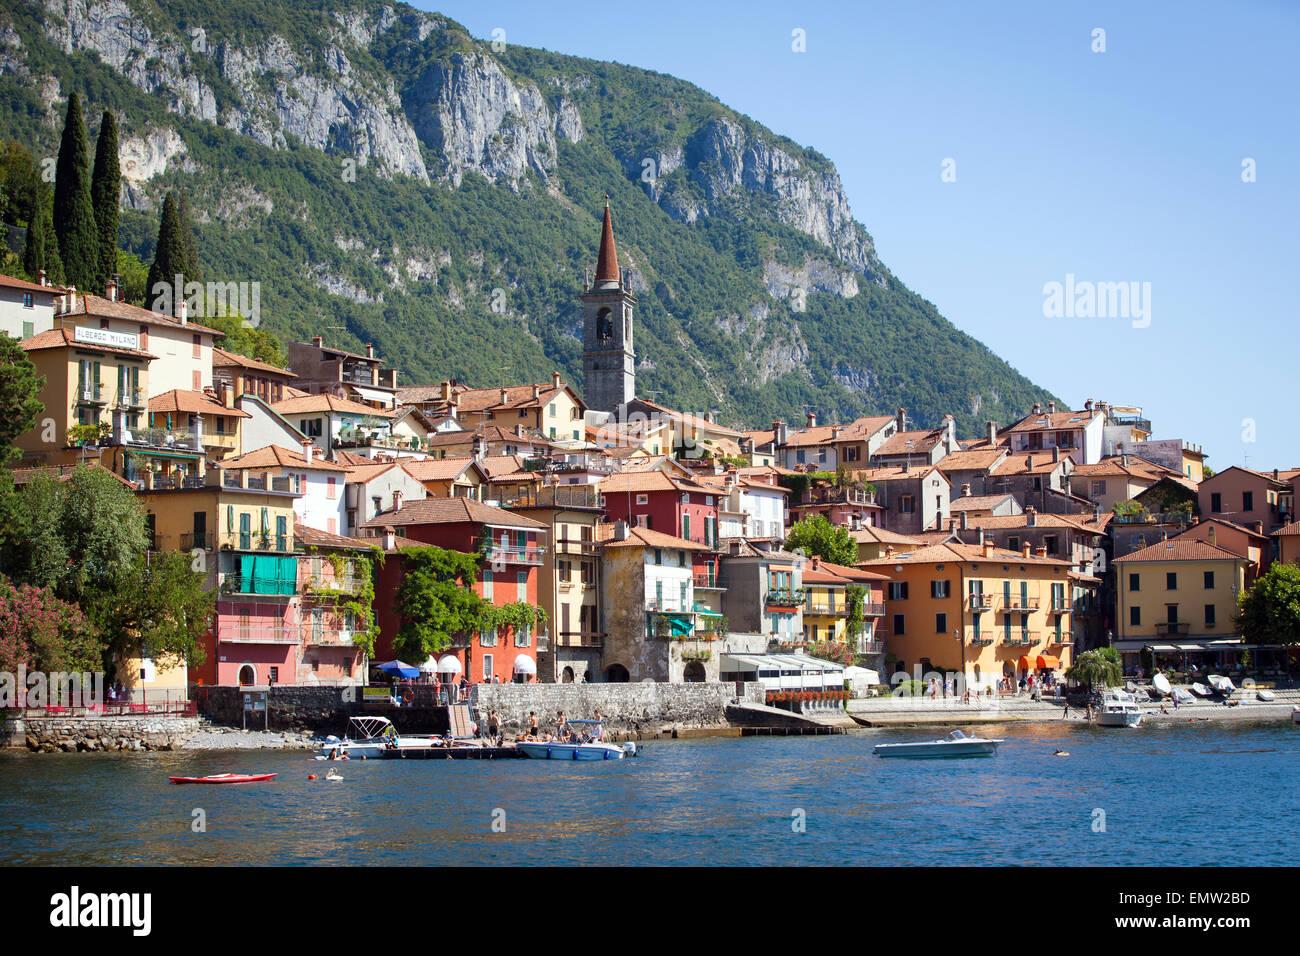 Town of Varenna in Lake Como, Italy - Stock Image